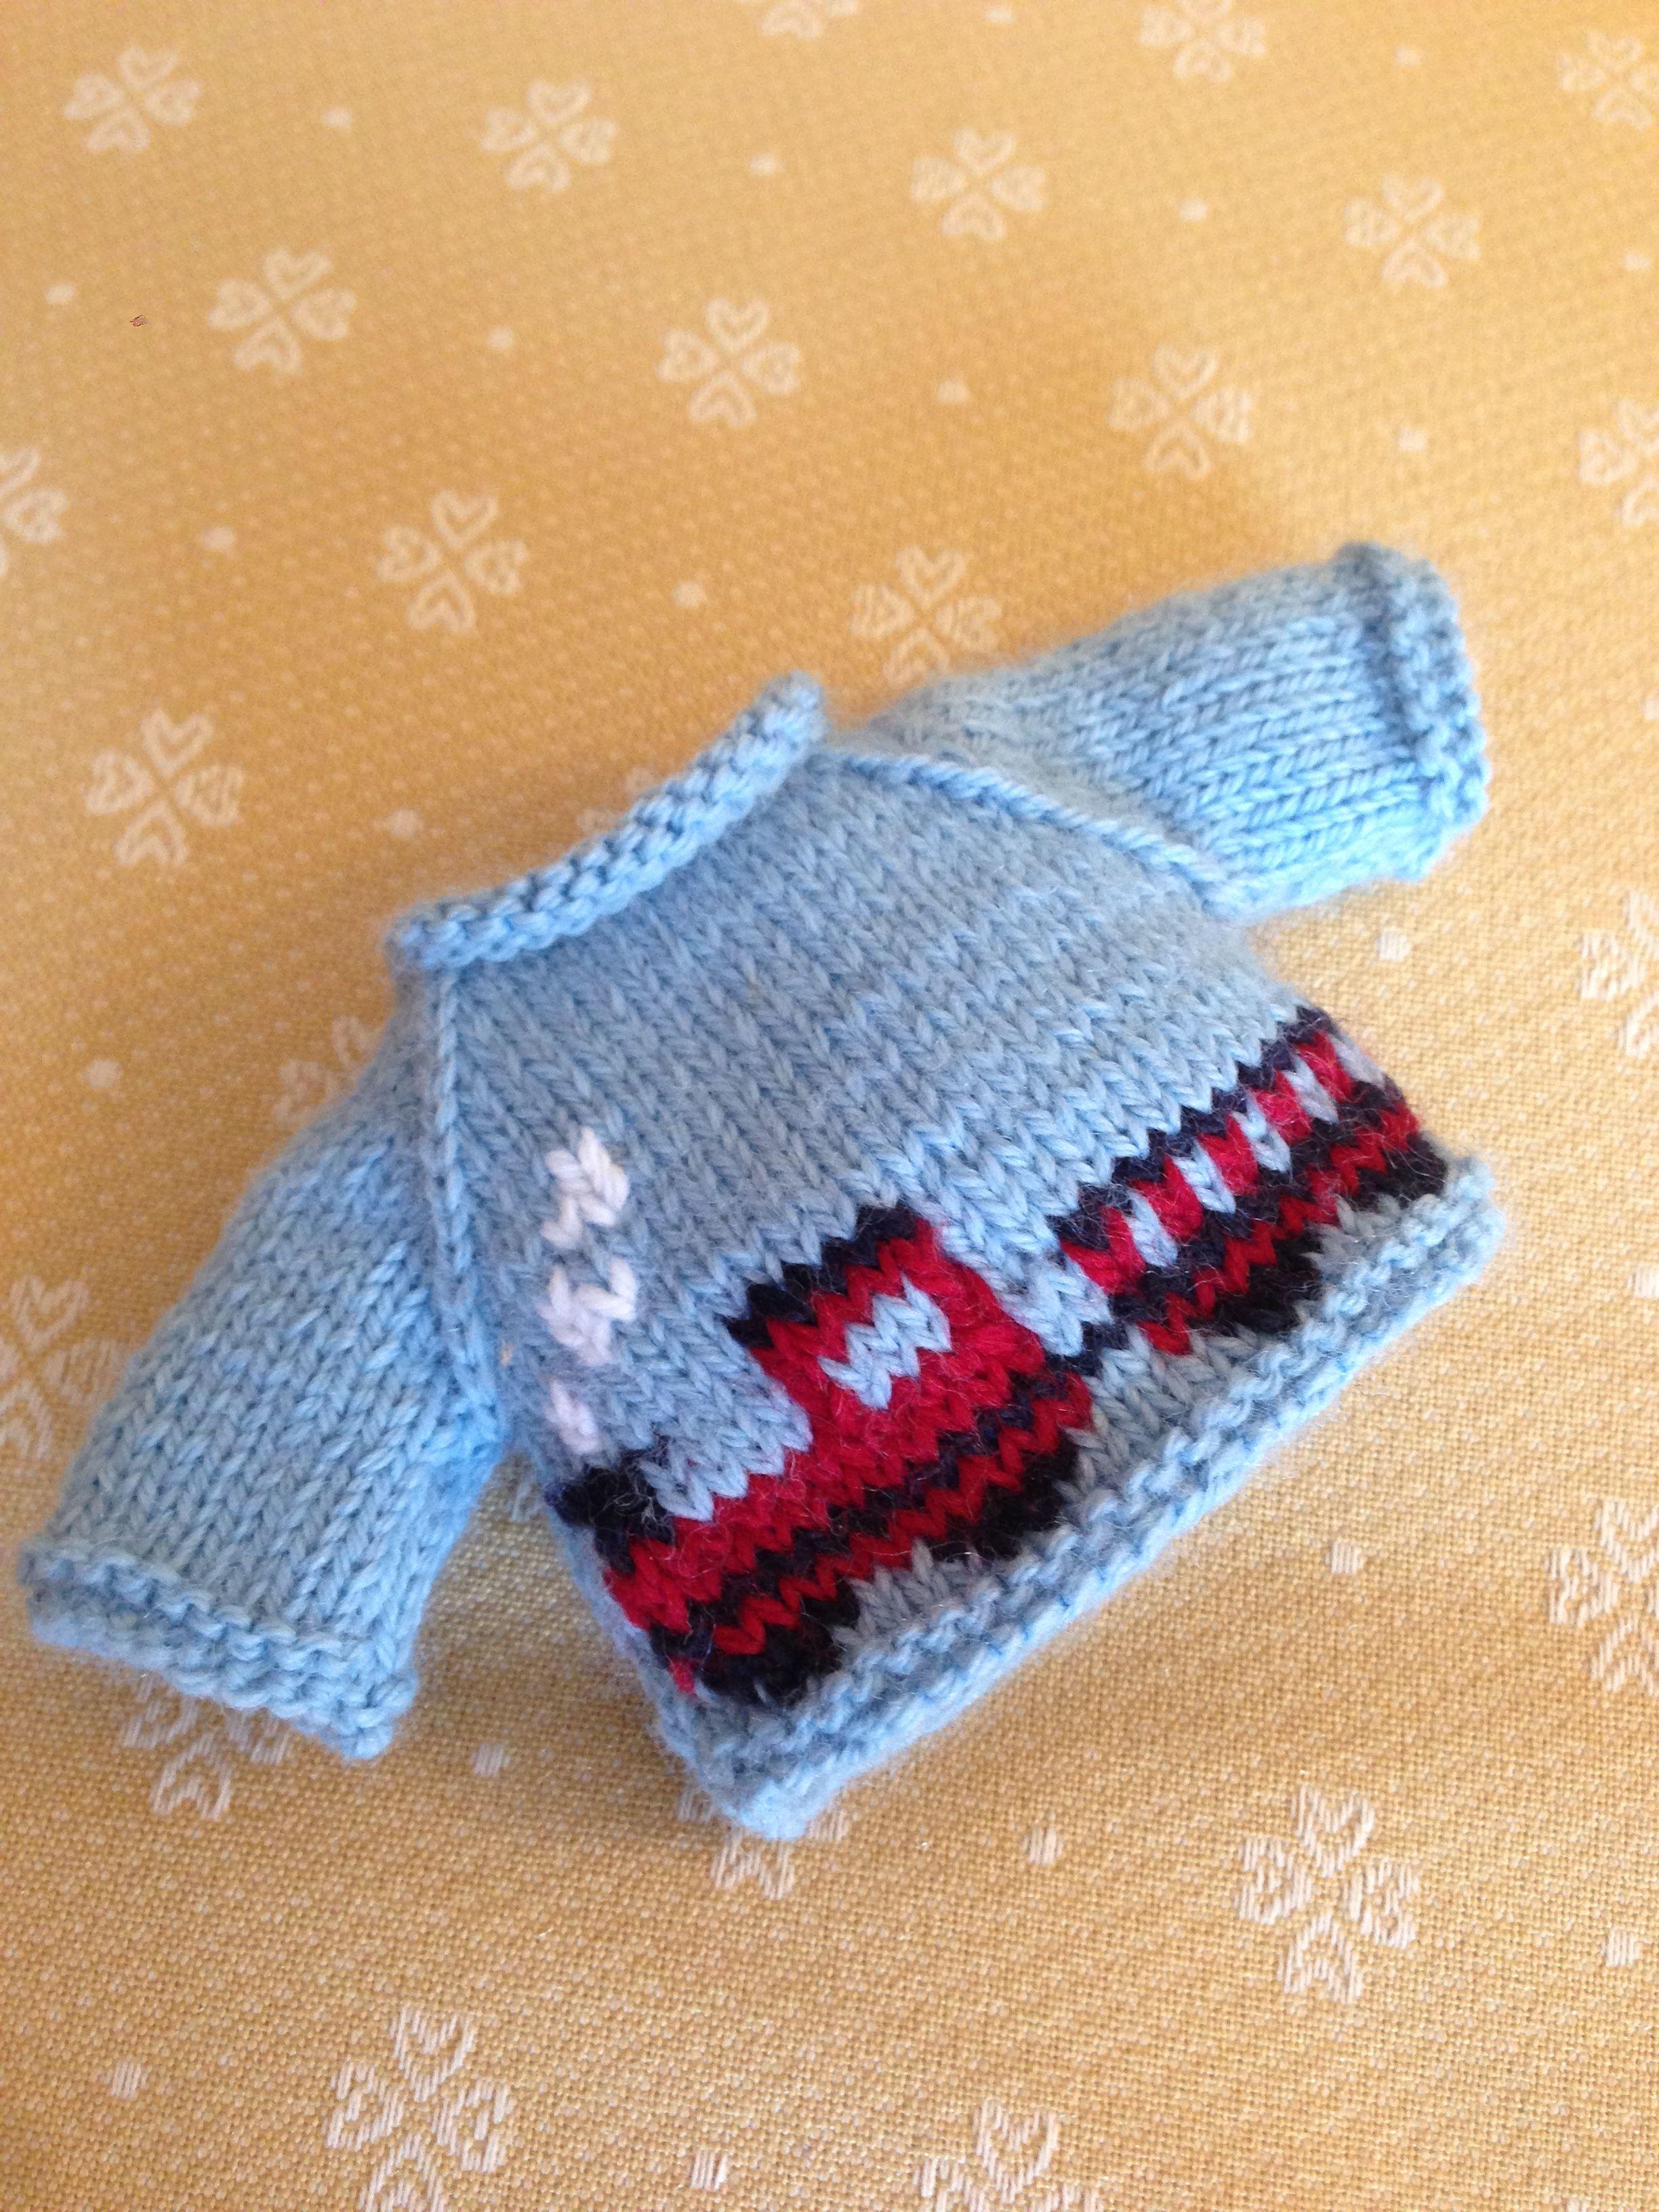 Pin de Elly Rozema en bunny | Pinterest | Animales de punto, Bebés ...